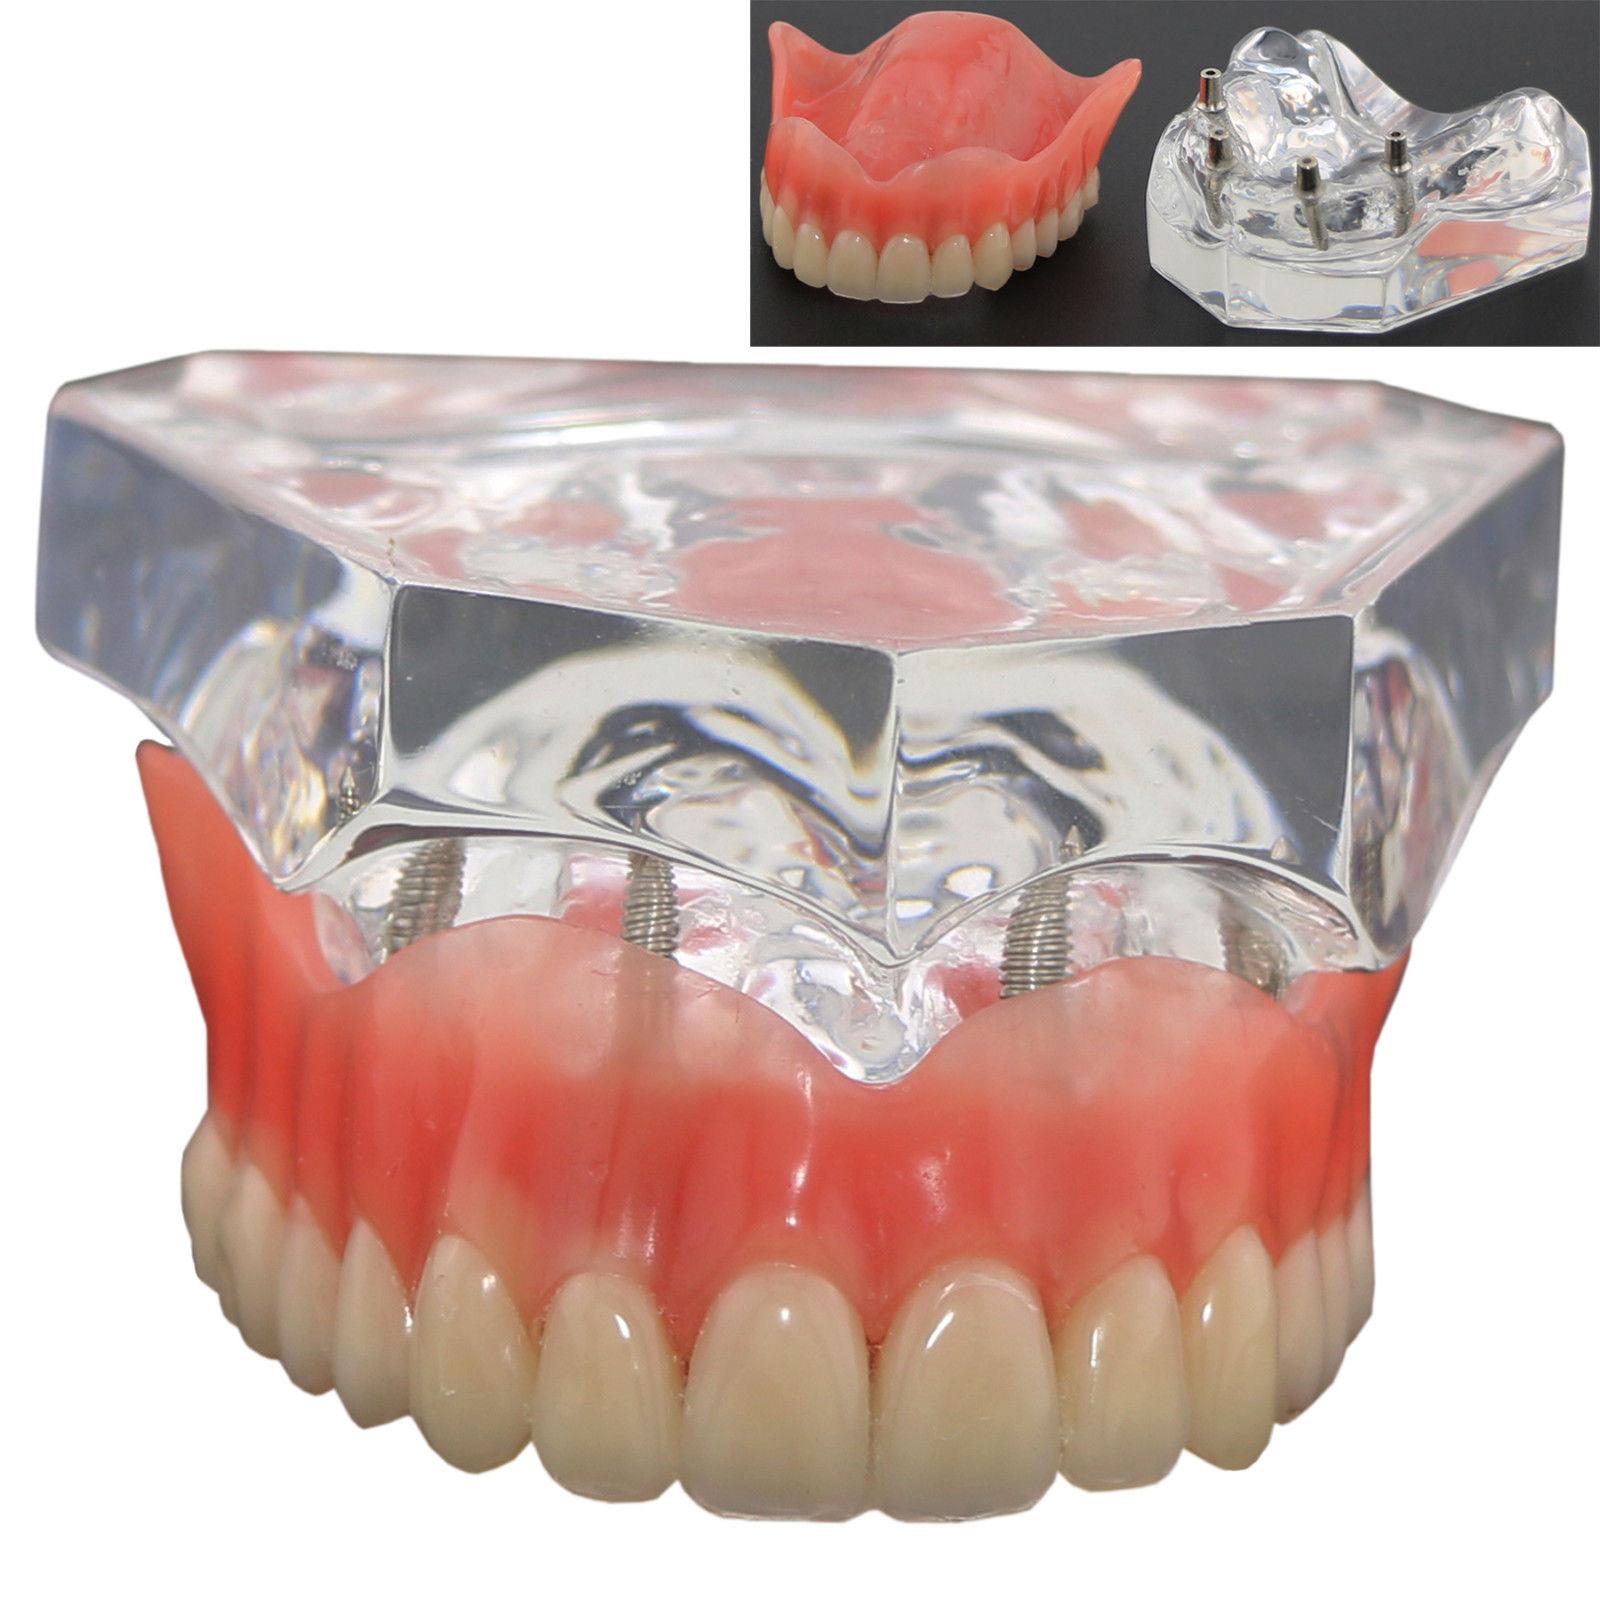 Dental Upper Overdenture Superior 4 Implants Demo Model 6001 02 Teeth ModelDental Upper Overdenture Superior 4 Implants Demo Model 6001 02 Teeth Model